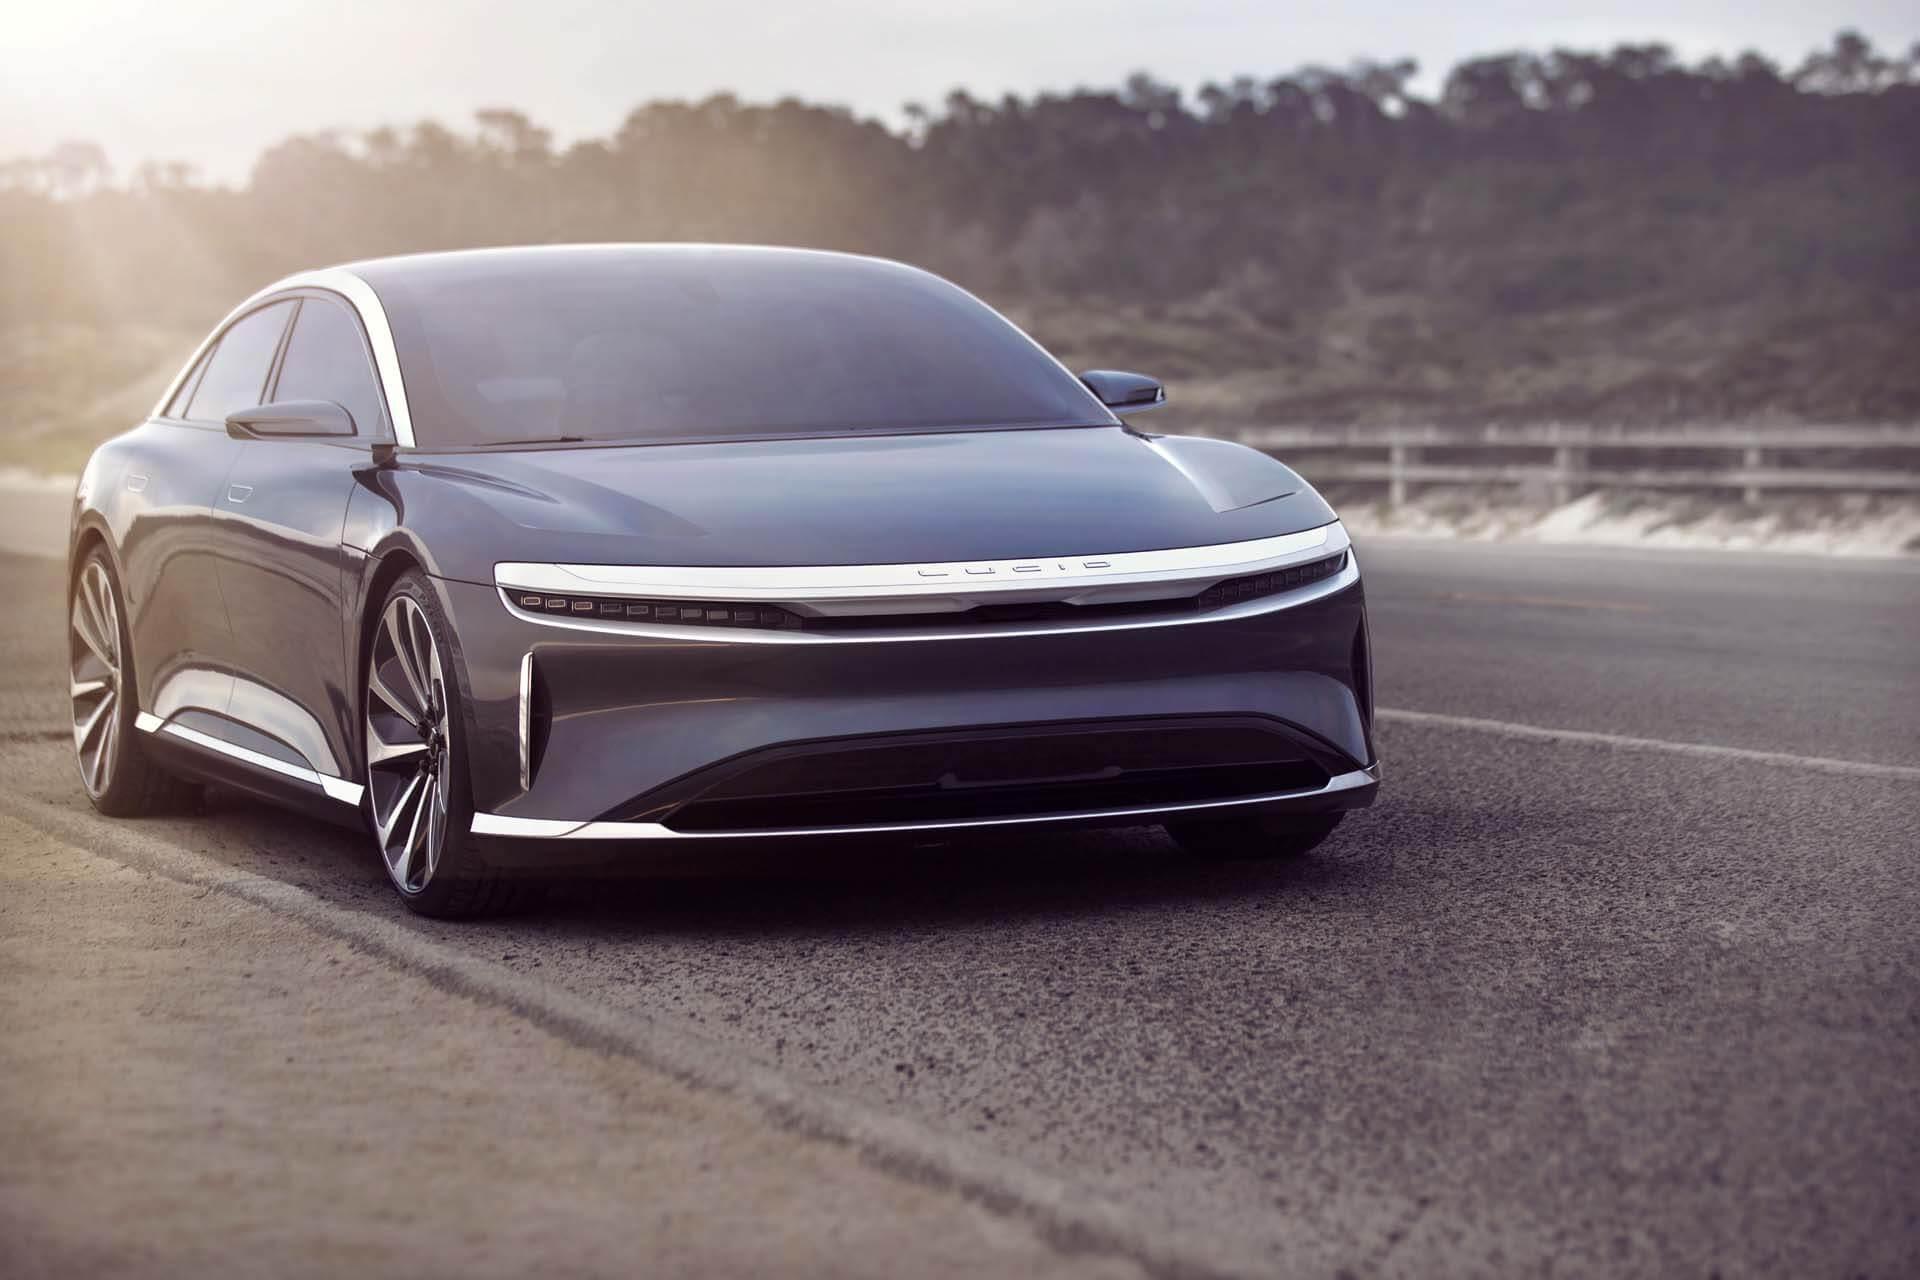 lucid air elektrikli otomobil https://huglero.com